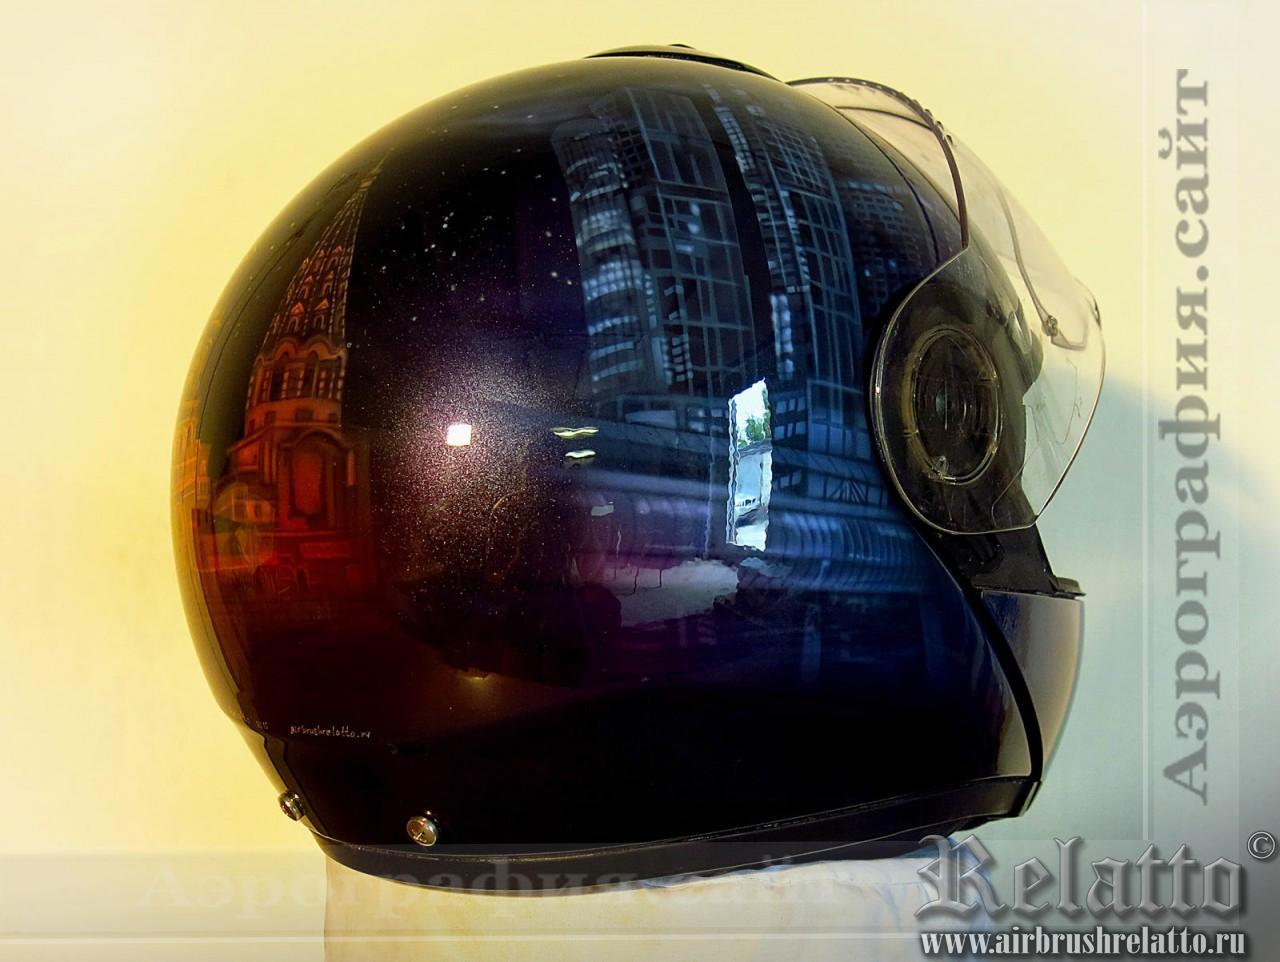 Роспись байкерского шлема